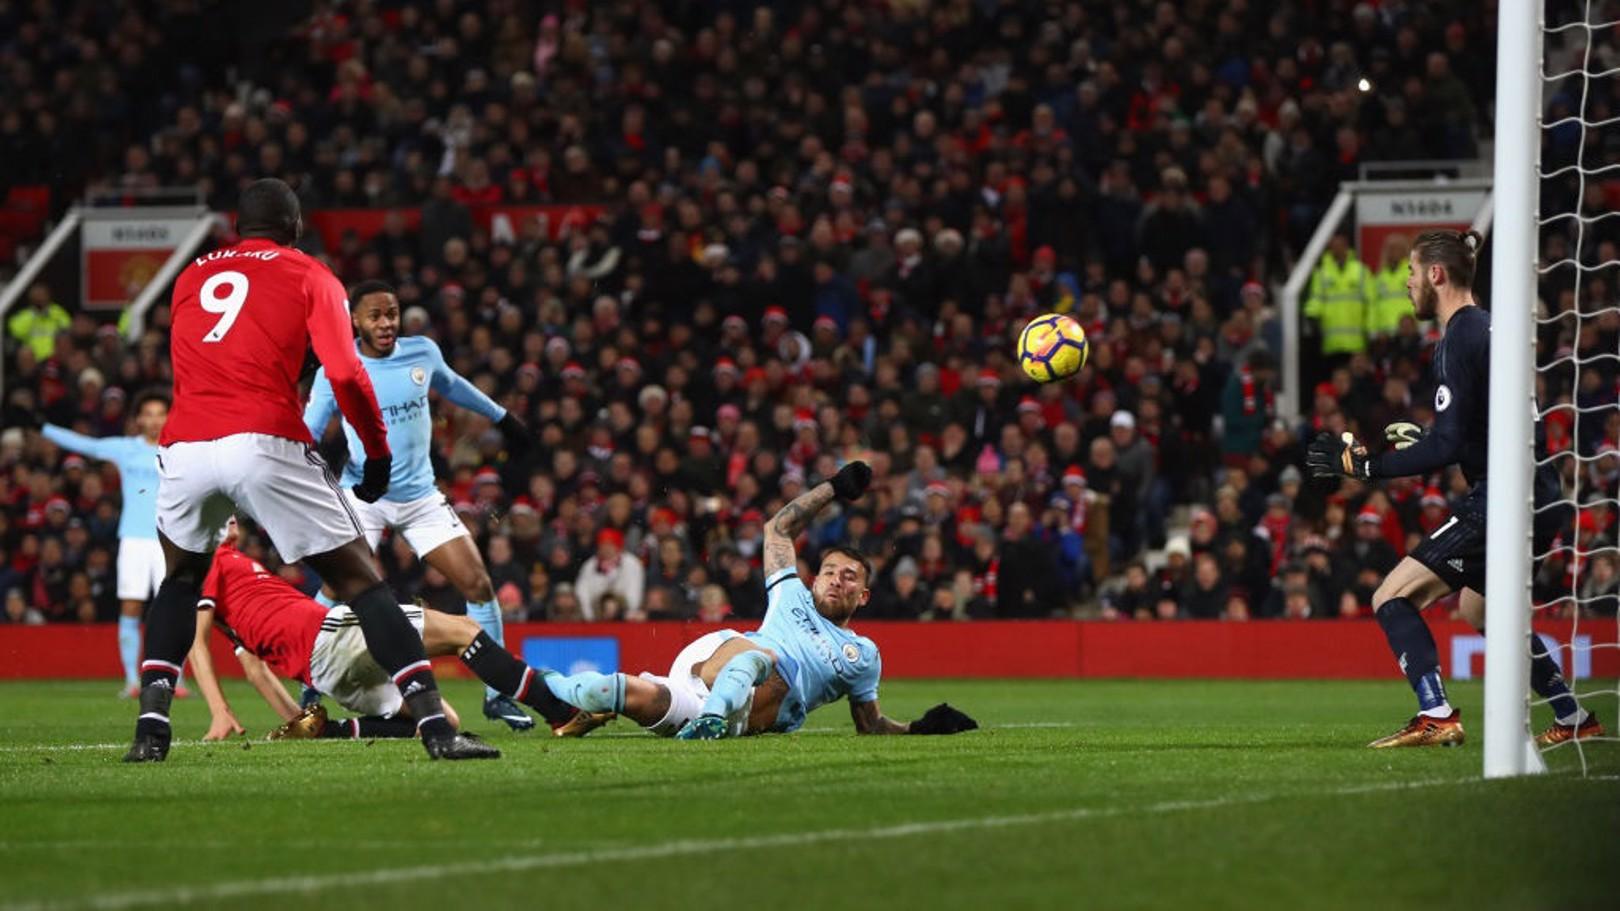 Otamendi marca el gol de la victoria en Old Trafford.